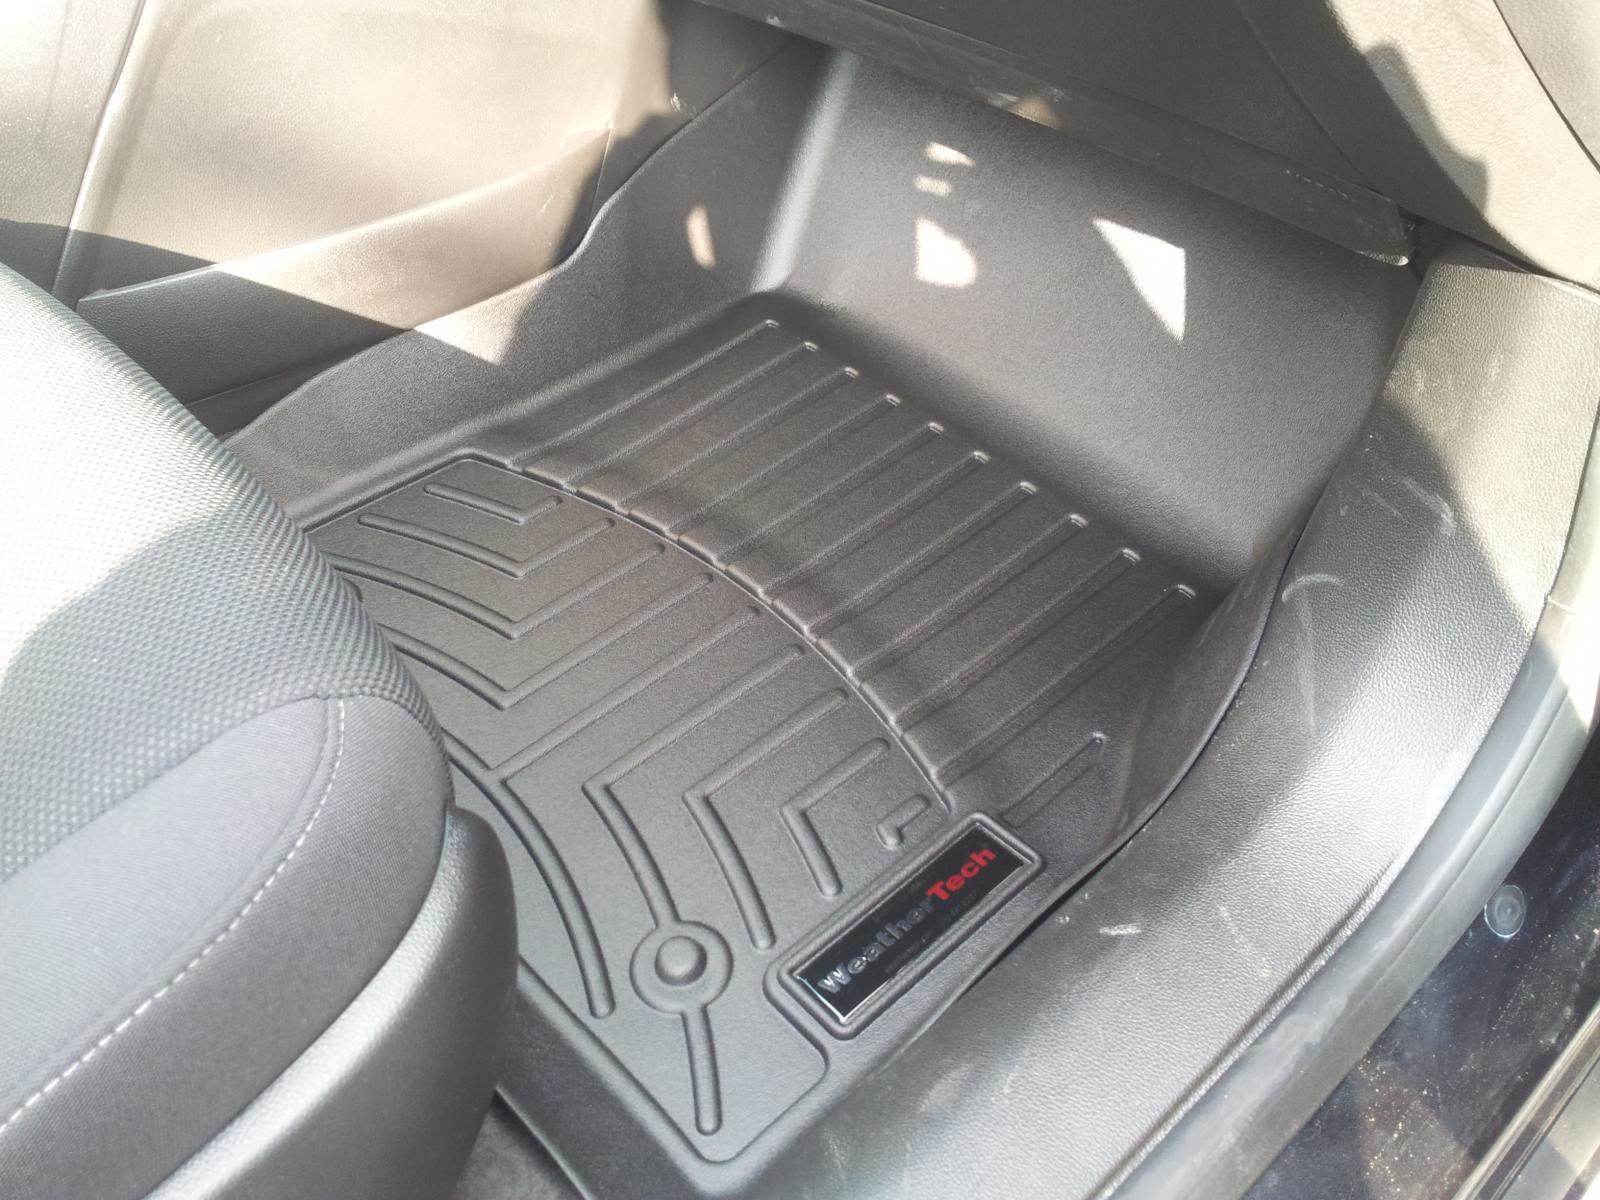 2012 Chevrolet Cruze ECO - Accessories